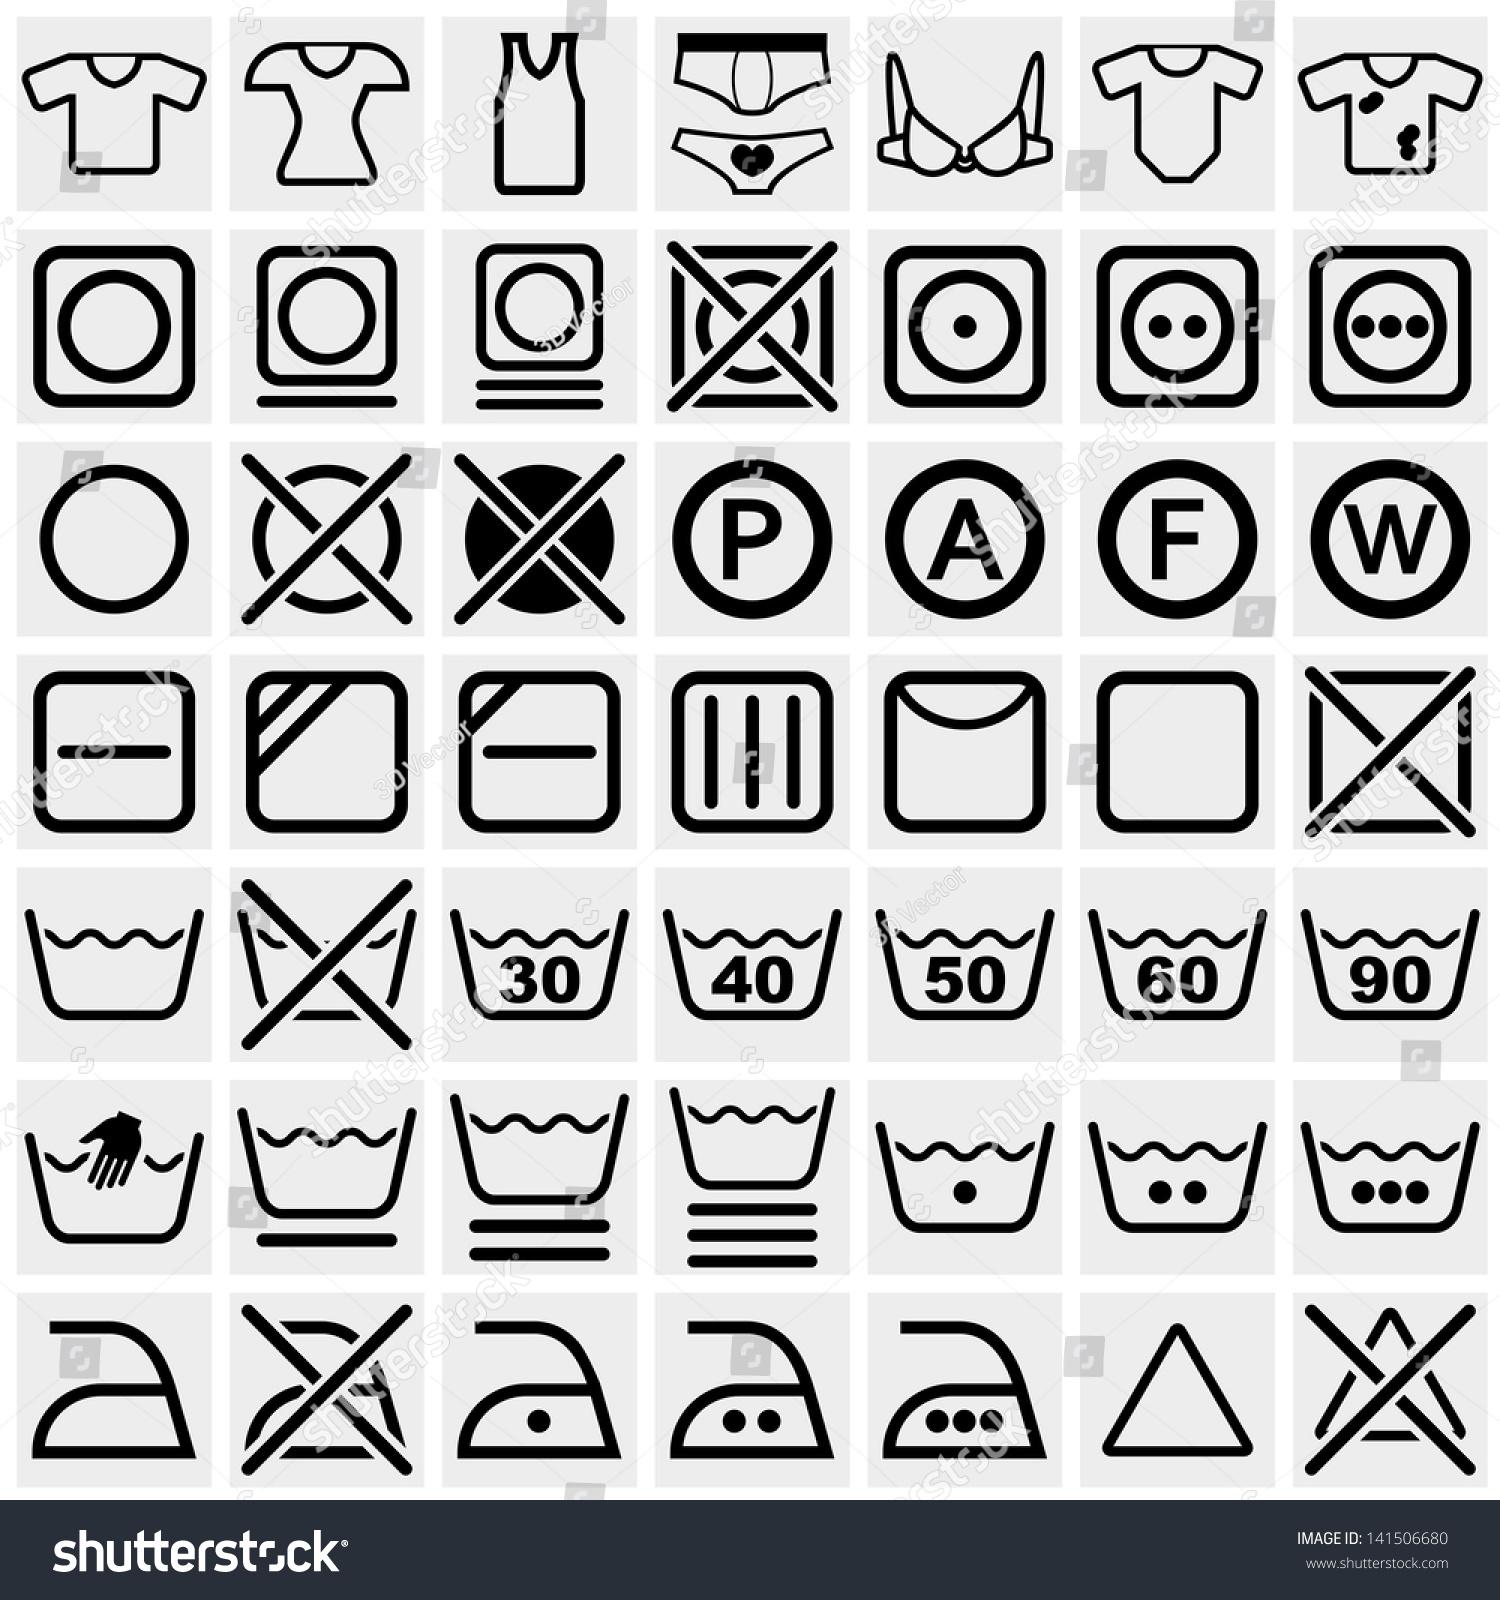 Similiar Machine Wash And Dry Cleaning Symbols Keywords